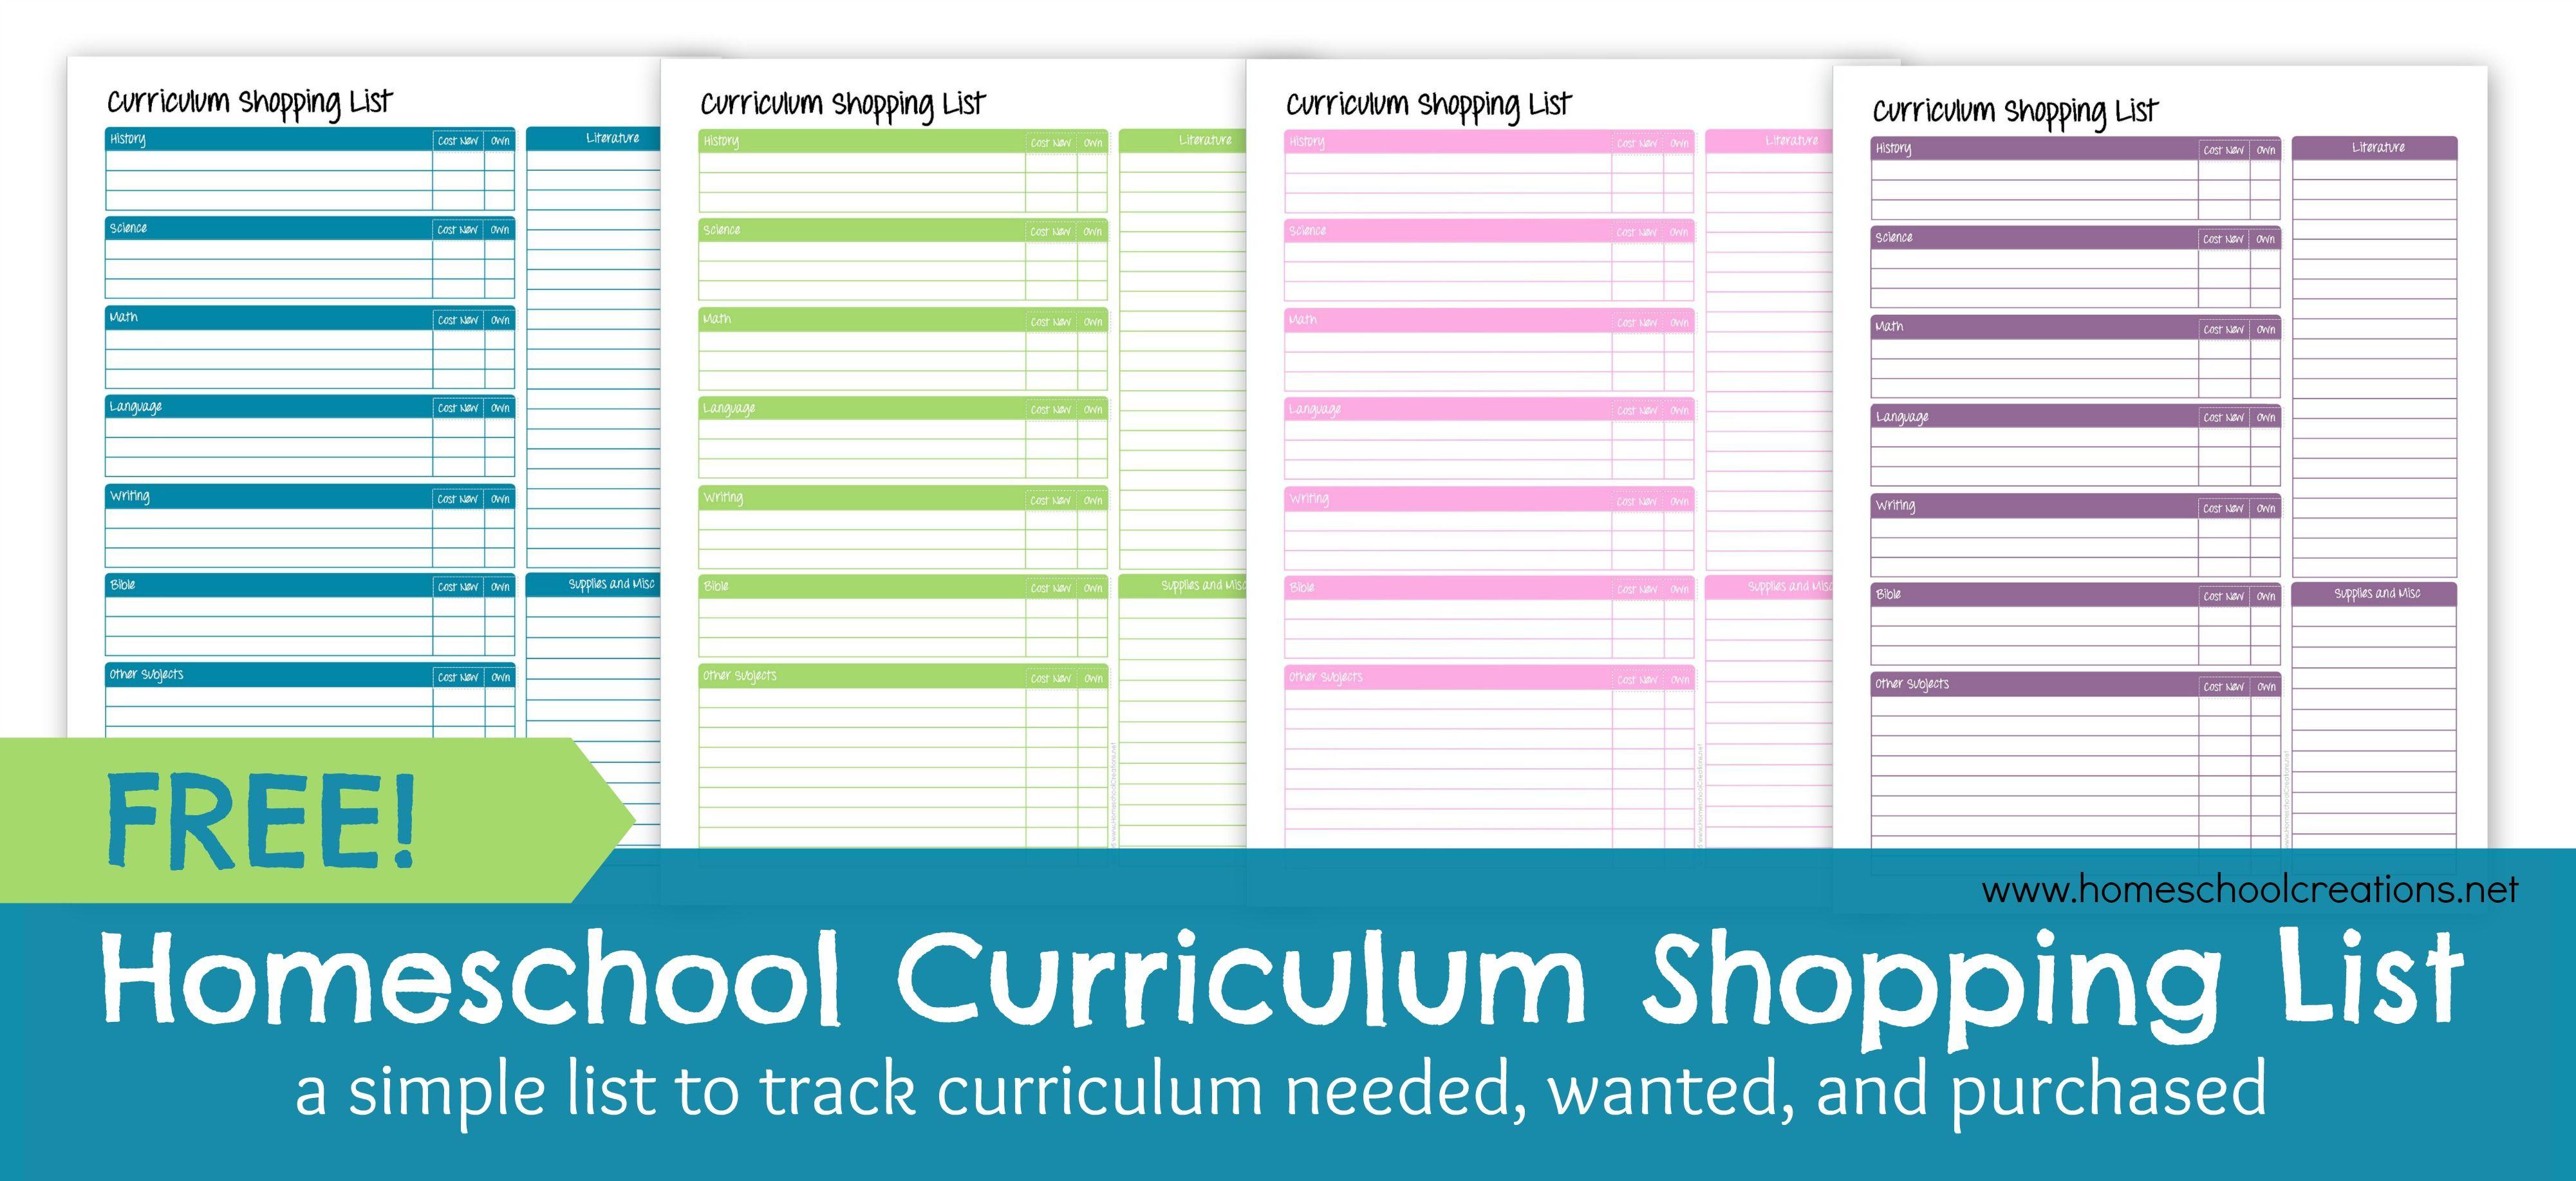 Homeschool Curriculum Shopping List: Free Printable ...